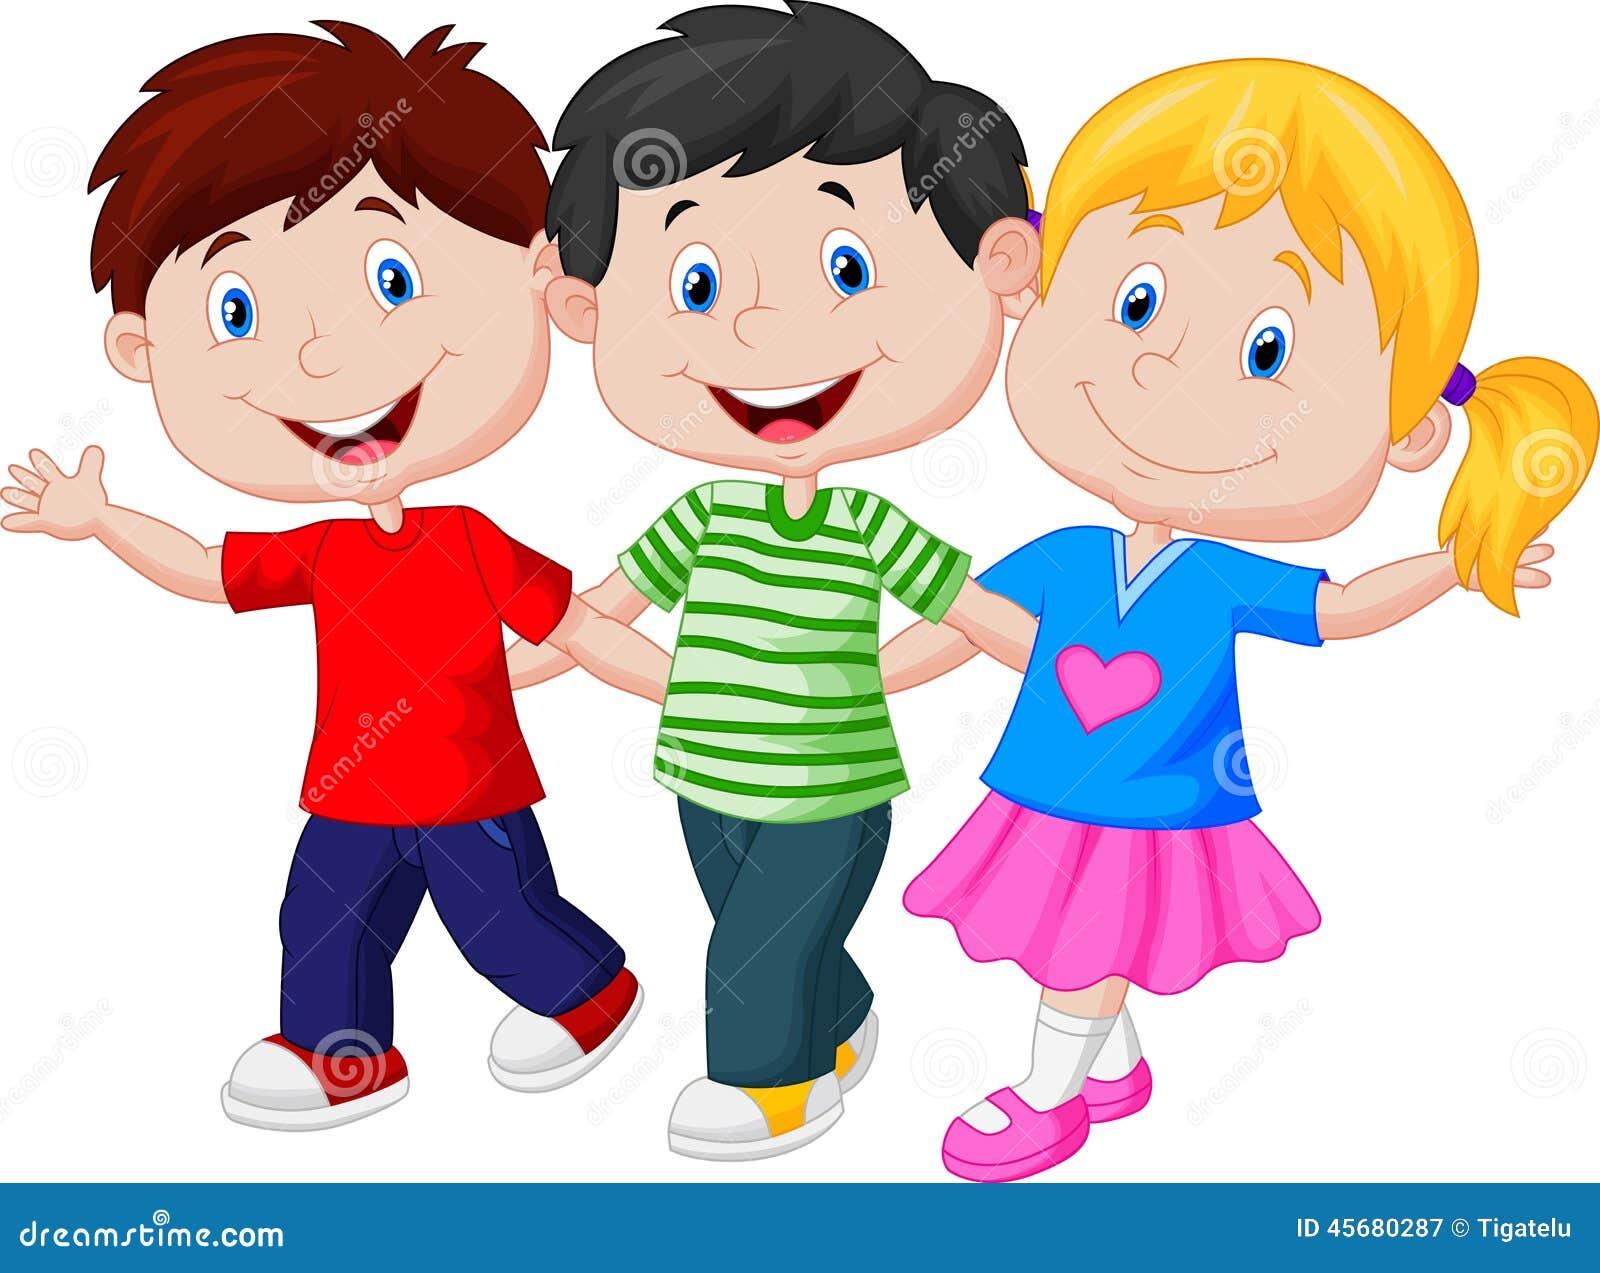 Happy Children Walking Together Stock Vector - Image: 45680287